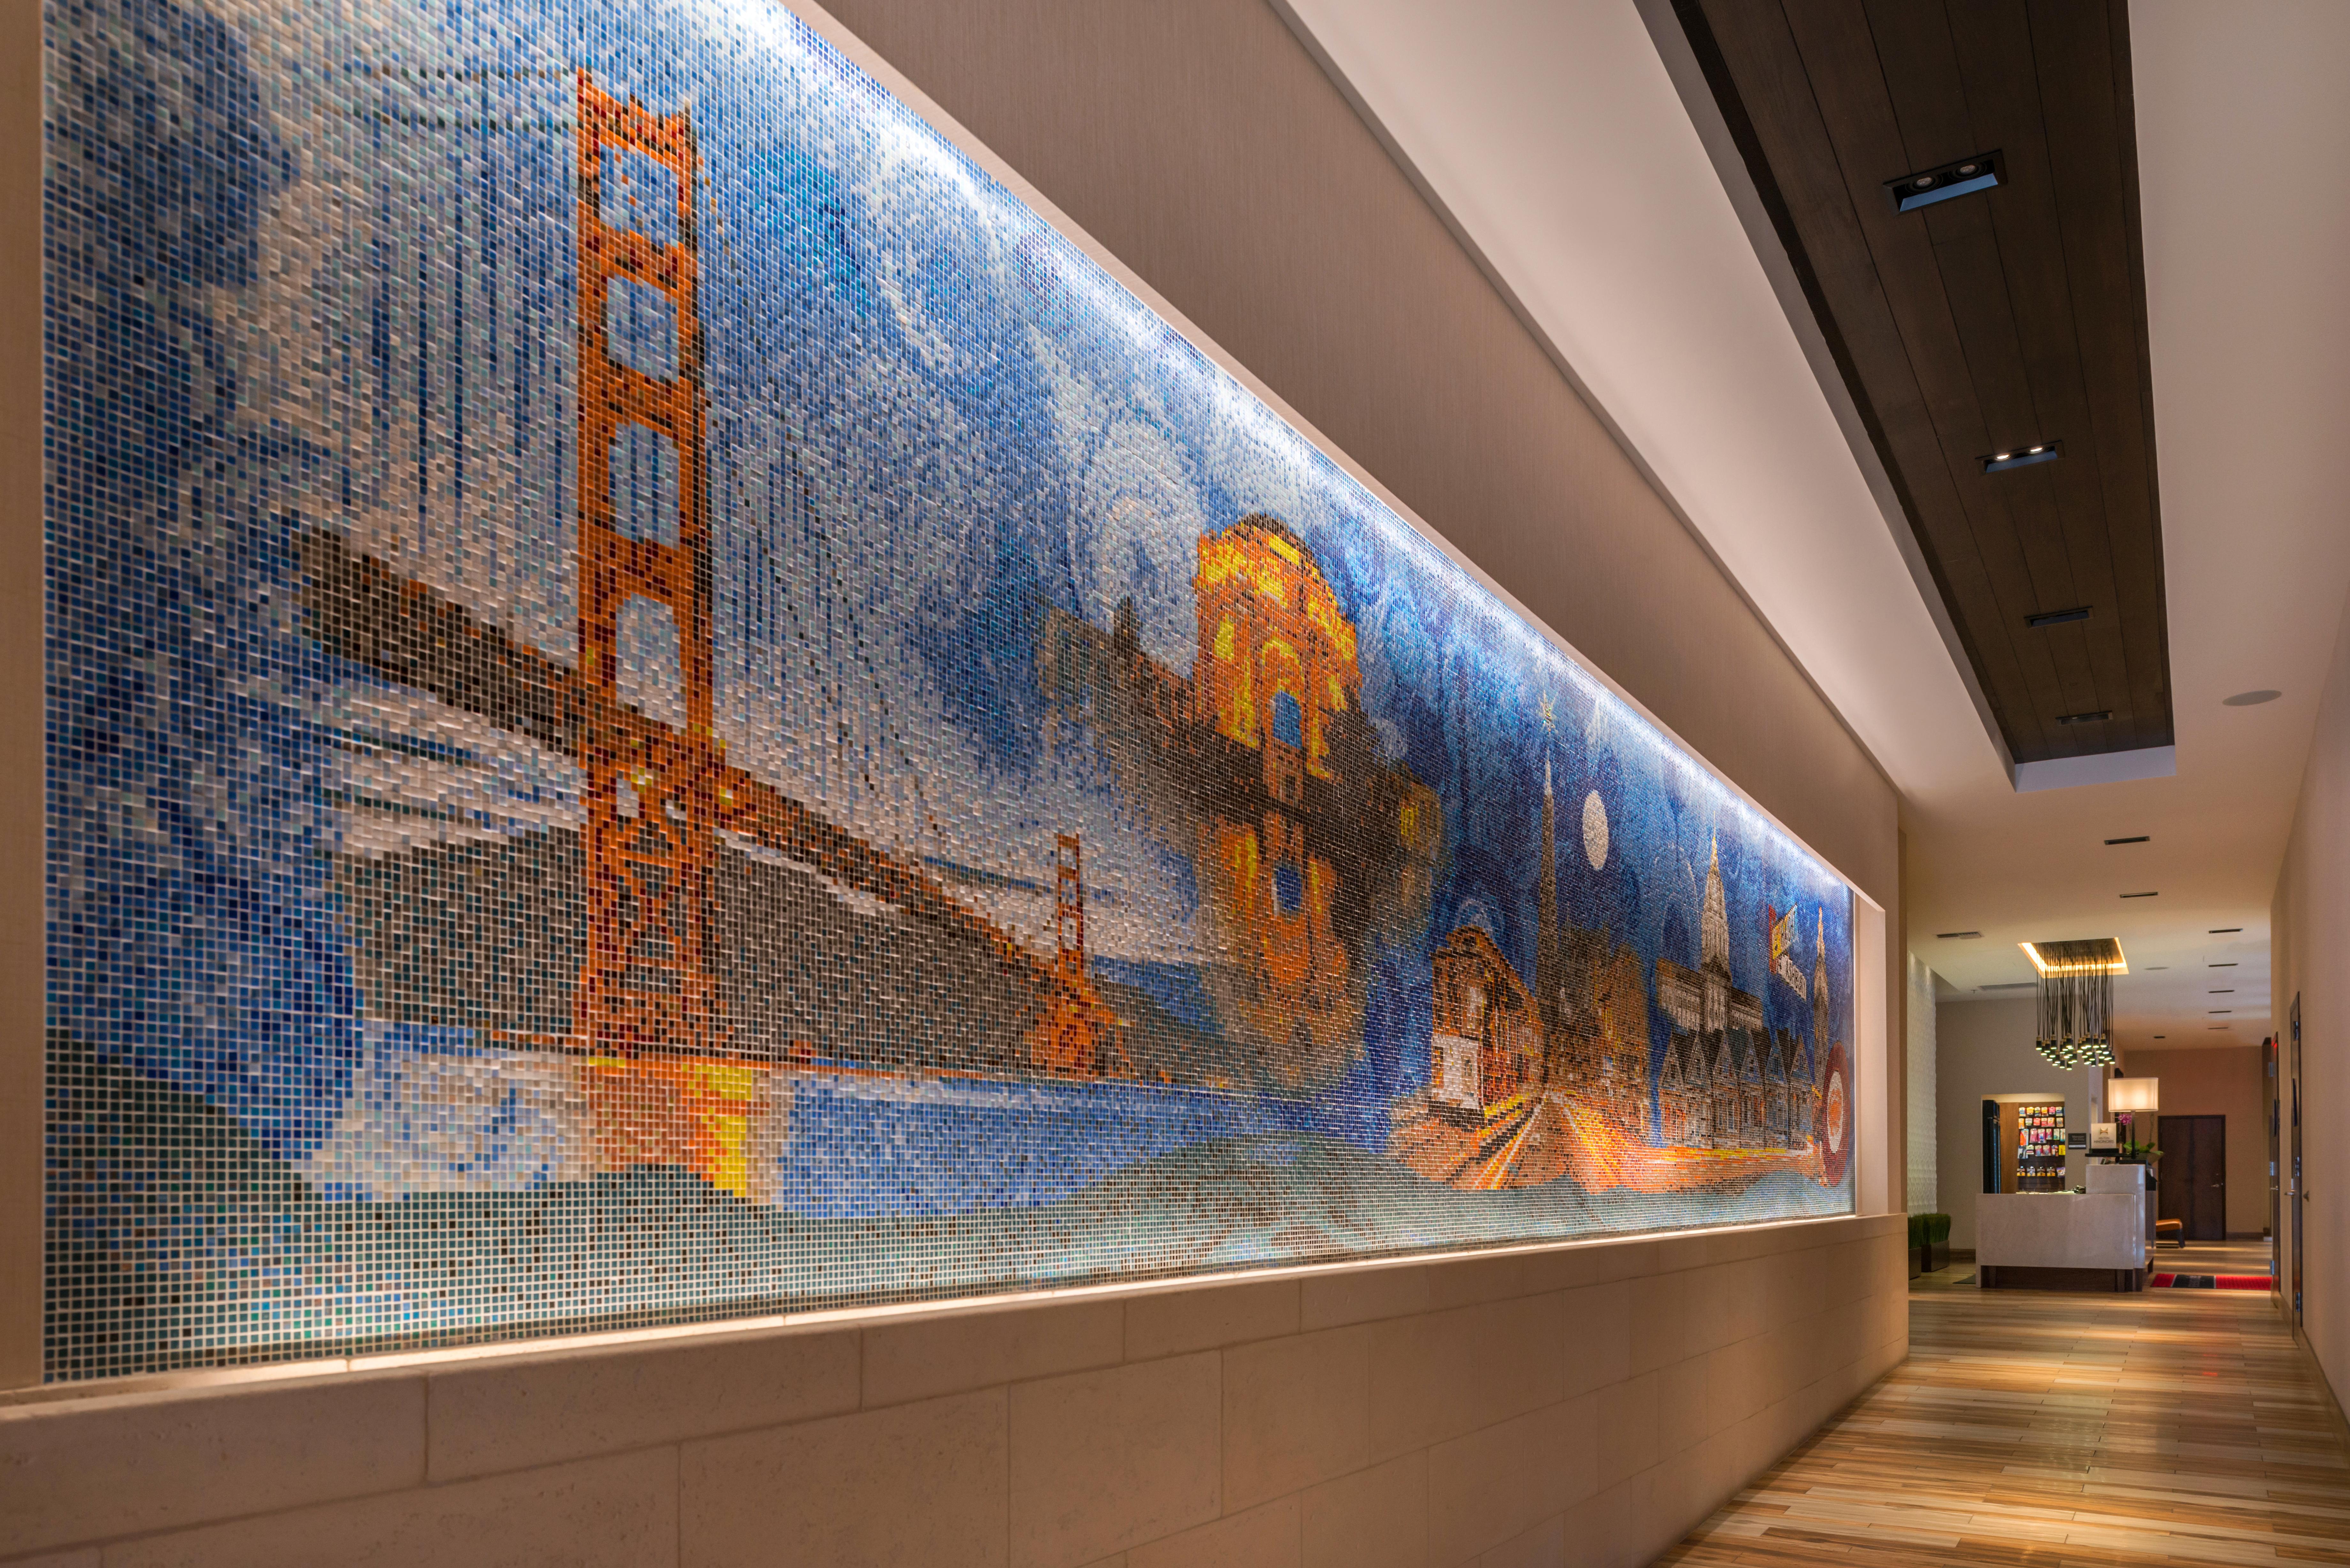 Hampton Inn SF Lobby Painting